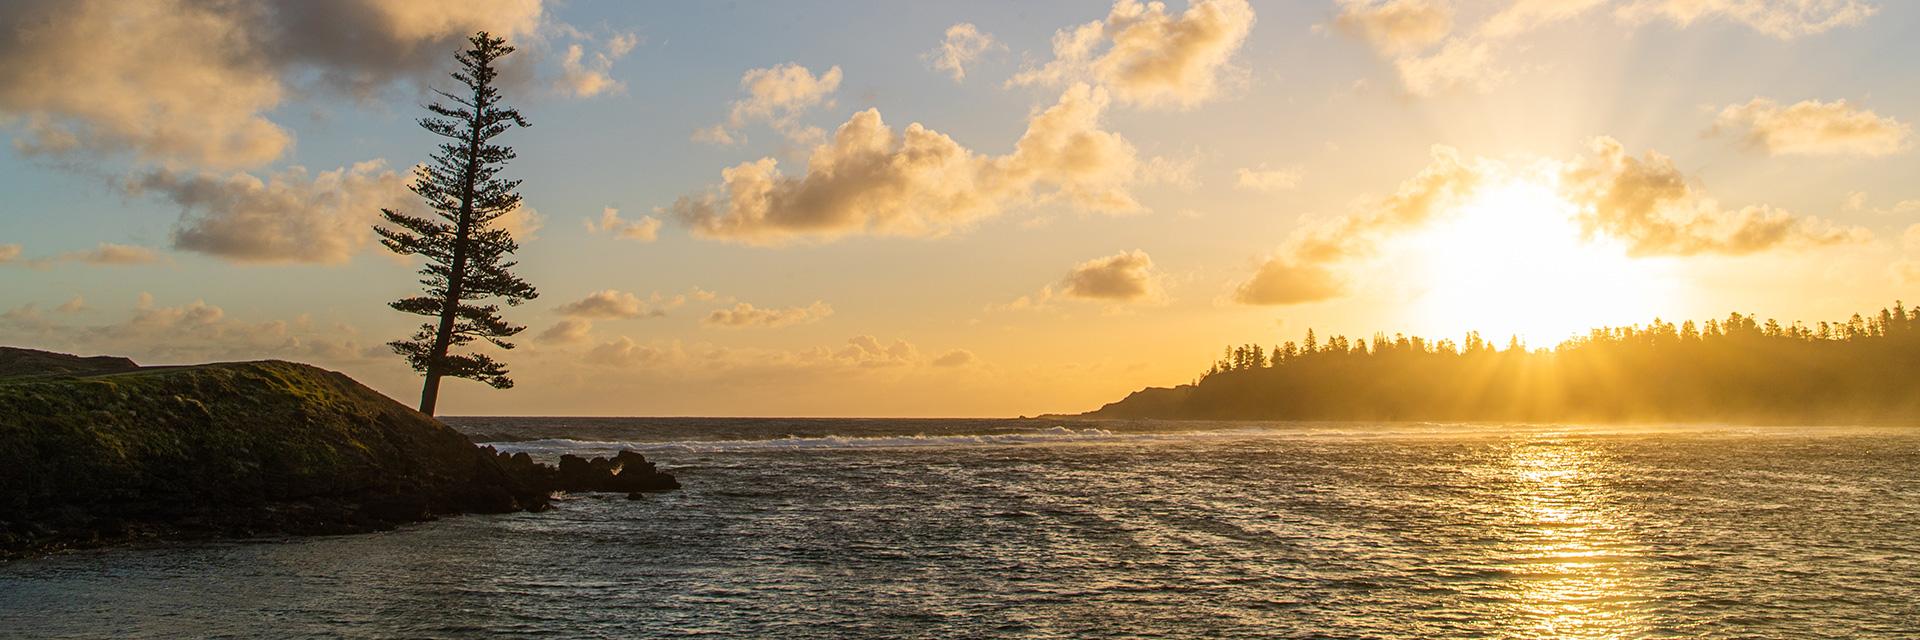 360° of Wonder on Norfolk Island